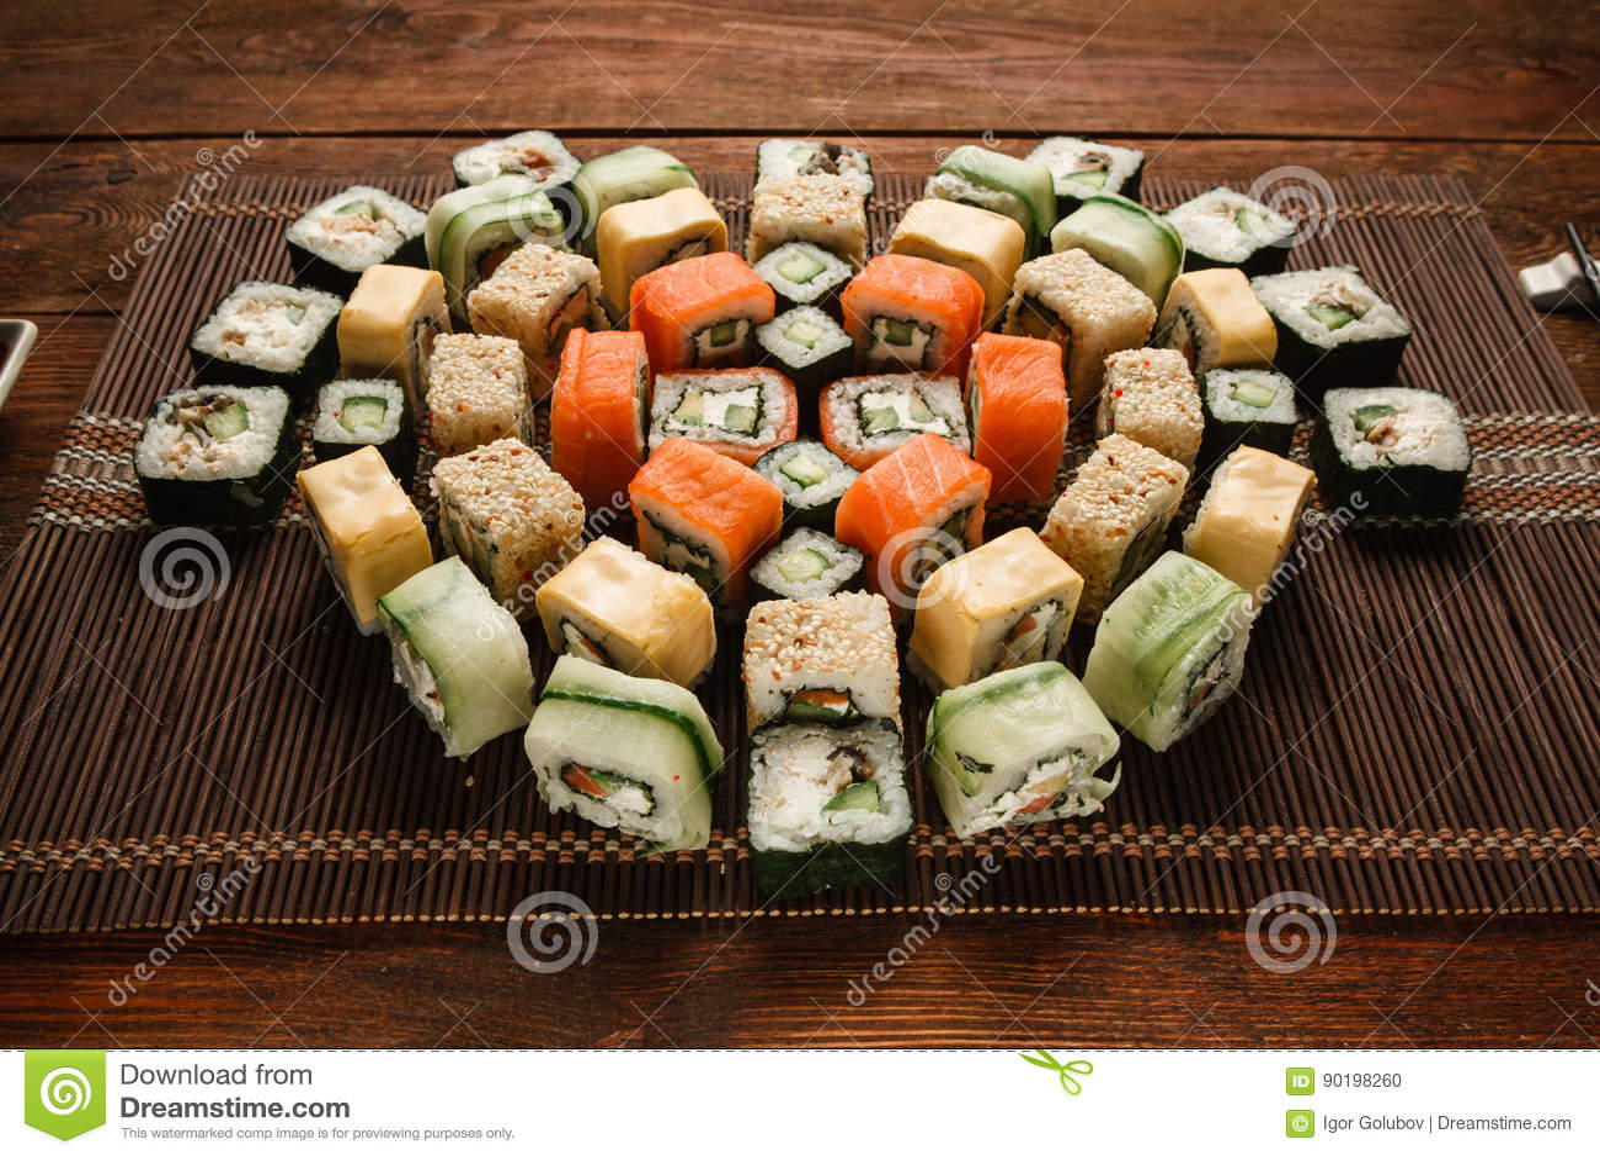 Tasty Colorful Set Of Japanese Sushi Rolls Closeup Stock Photo Image Of Oriental Seaweed 90198260